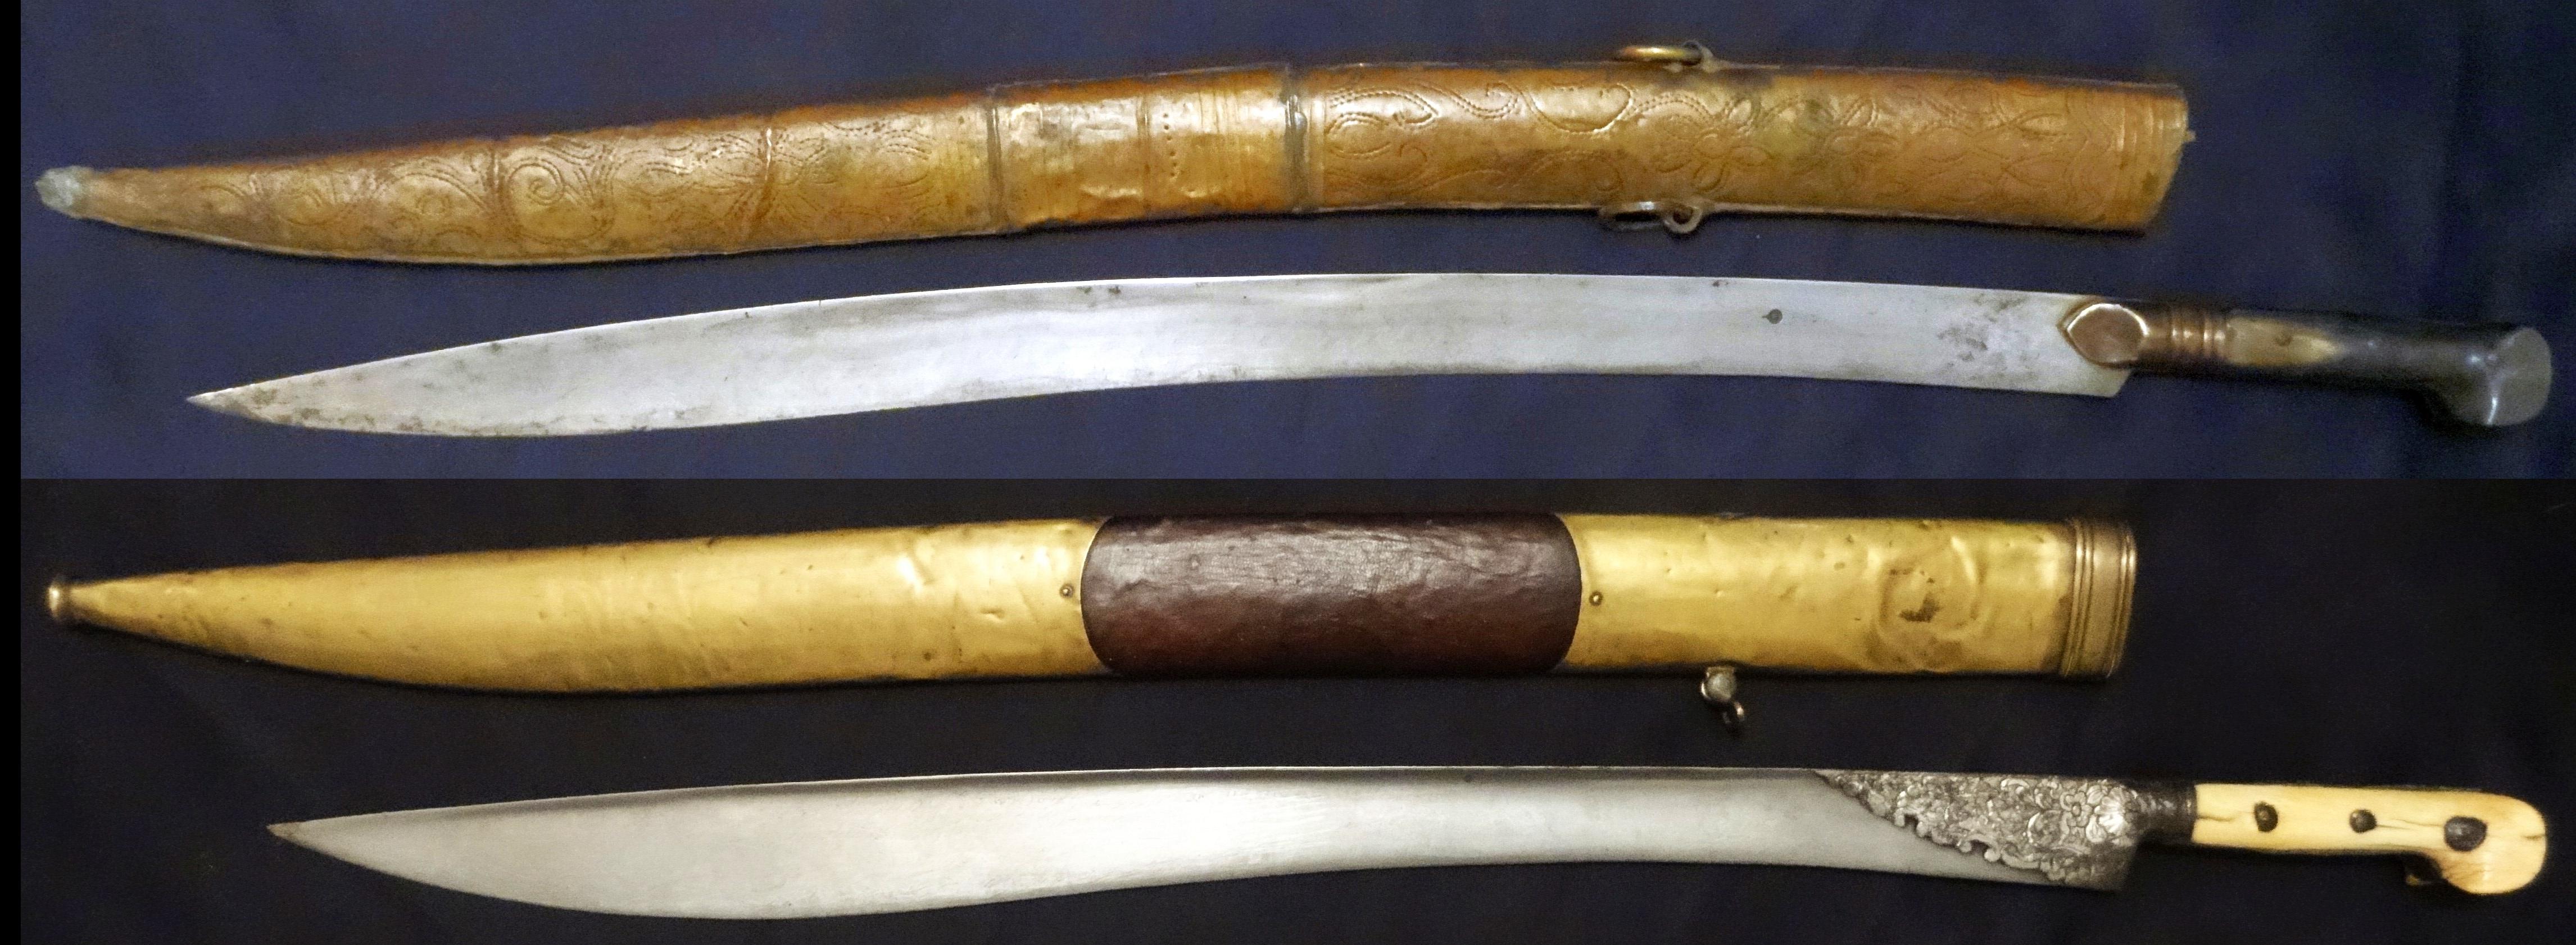 yatagan yataghan turco ottomani la spada perfetta